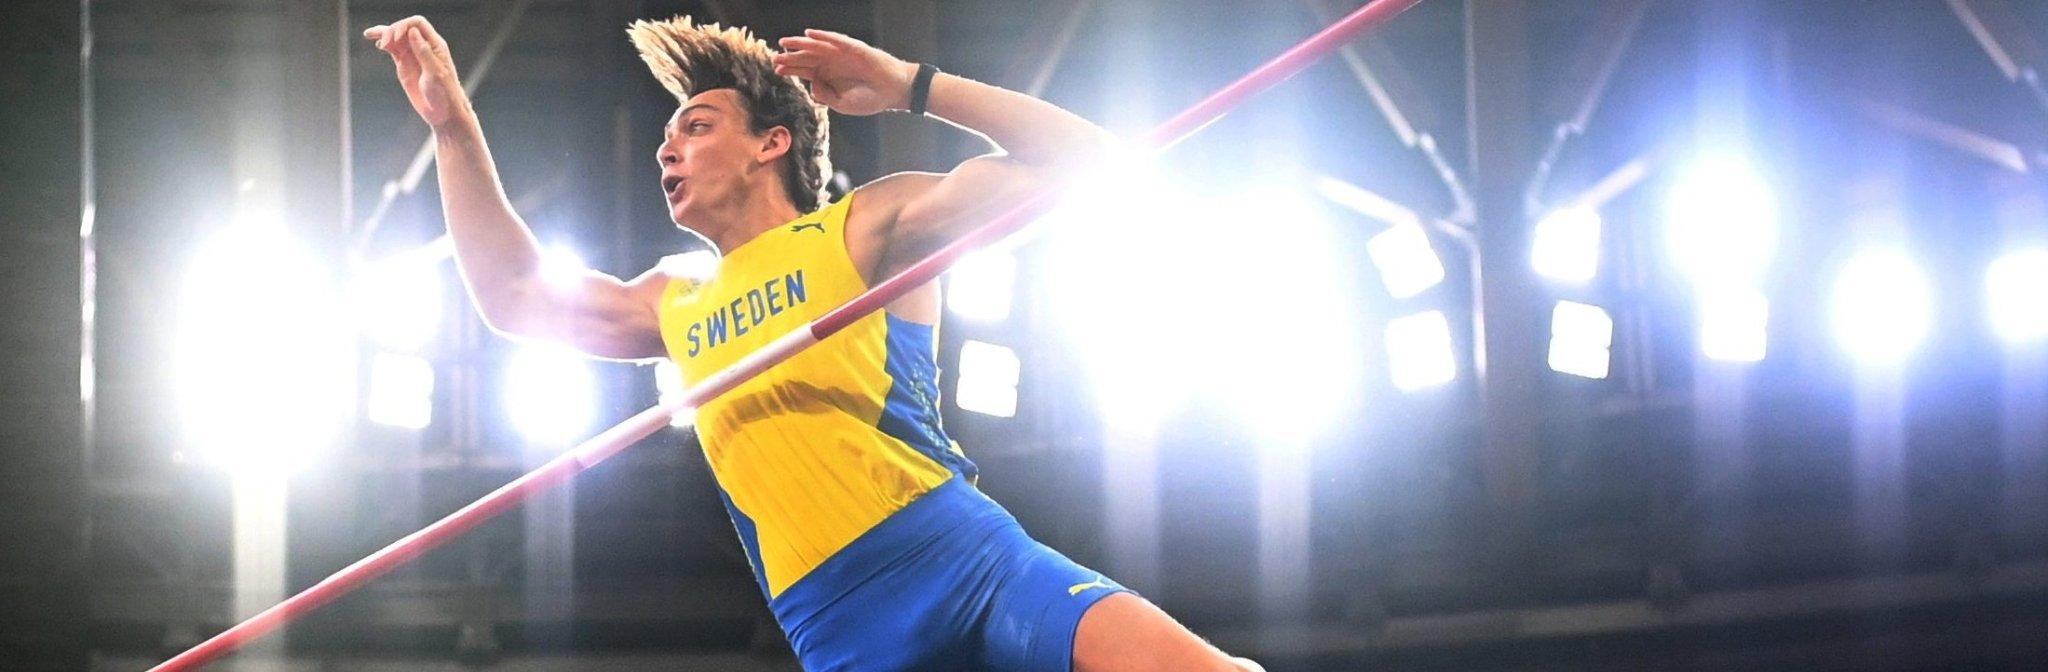 Olympics-Athletics-Sweden's Duplantis soars to pole vault gold